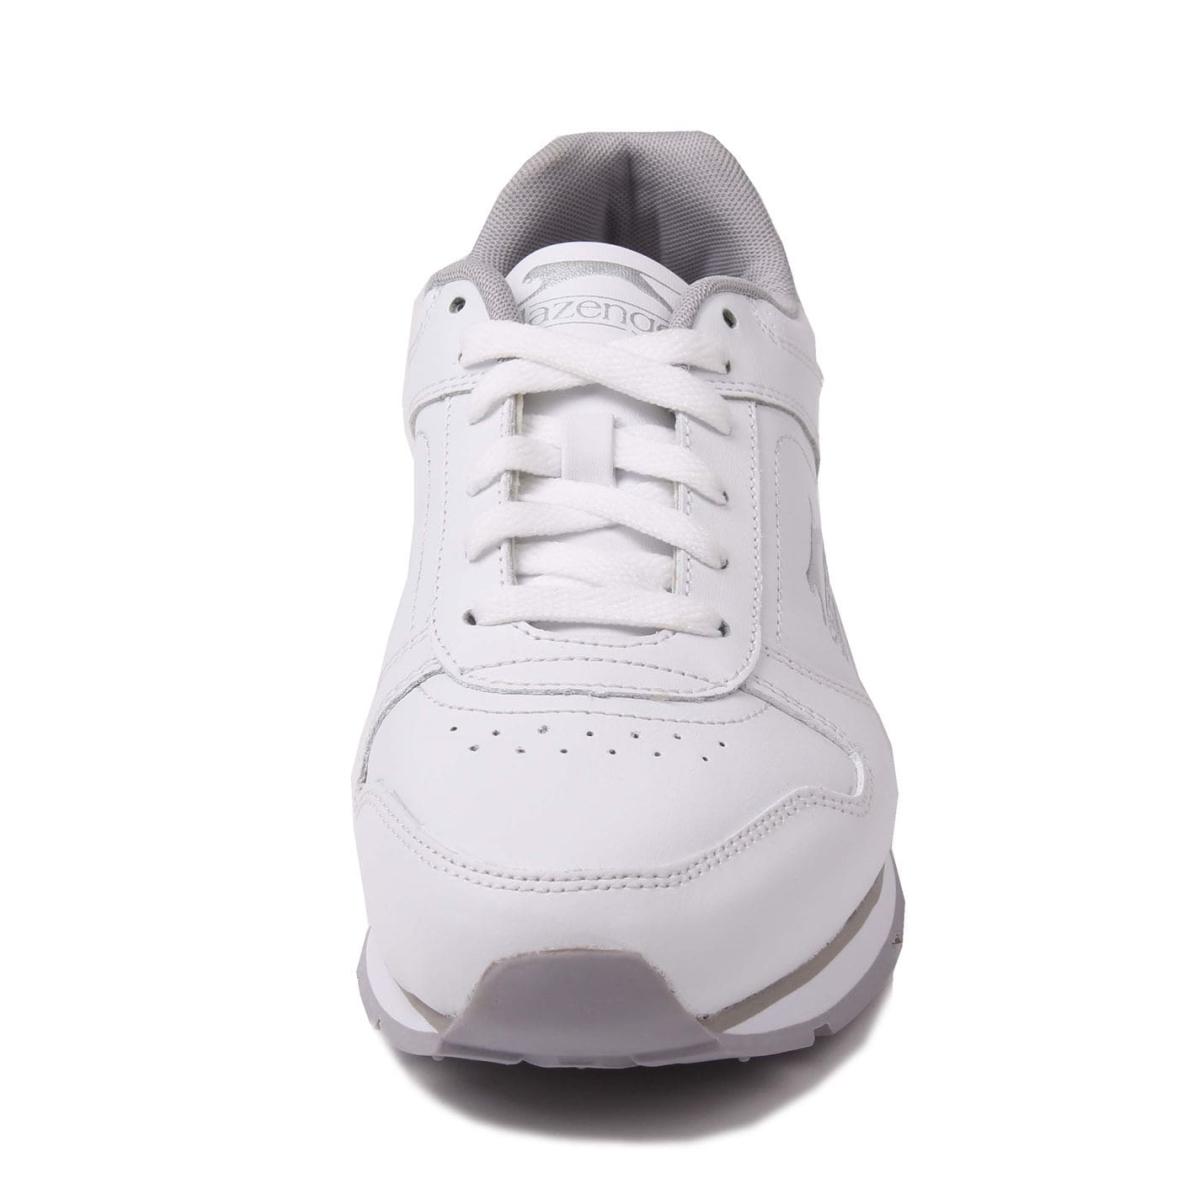 Slazenger-Classic-Turnschuhe-Laufschuhe-Damen-Sportschuhe-Sneaker-1265 Indexbild 27